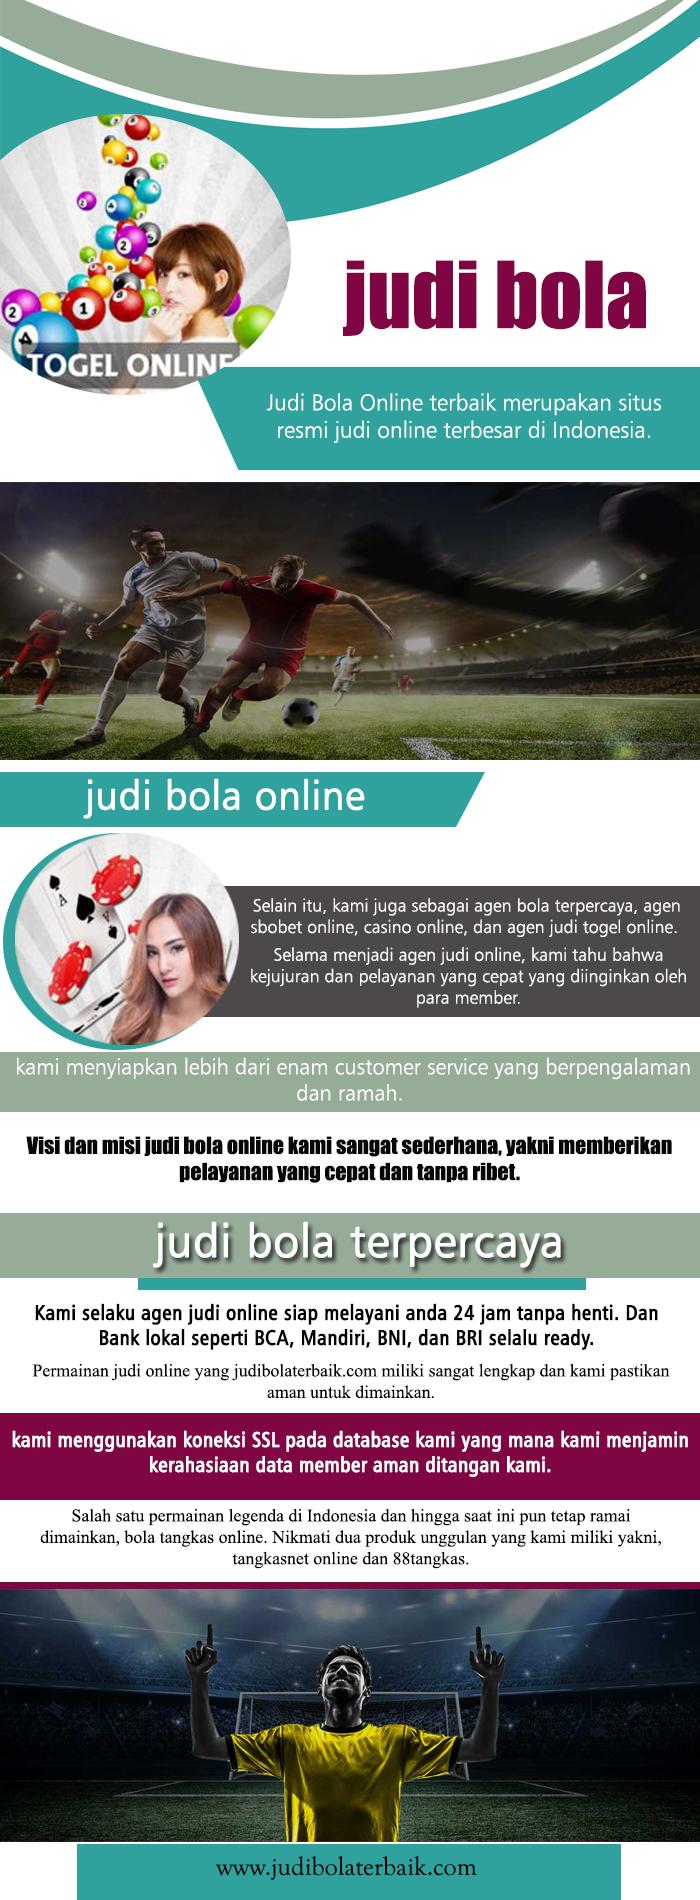 Judi Bola Indonesia